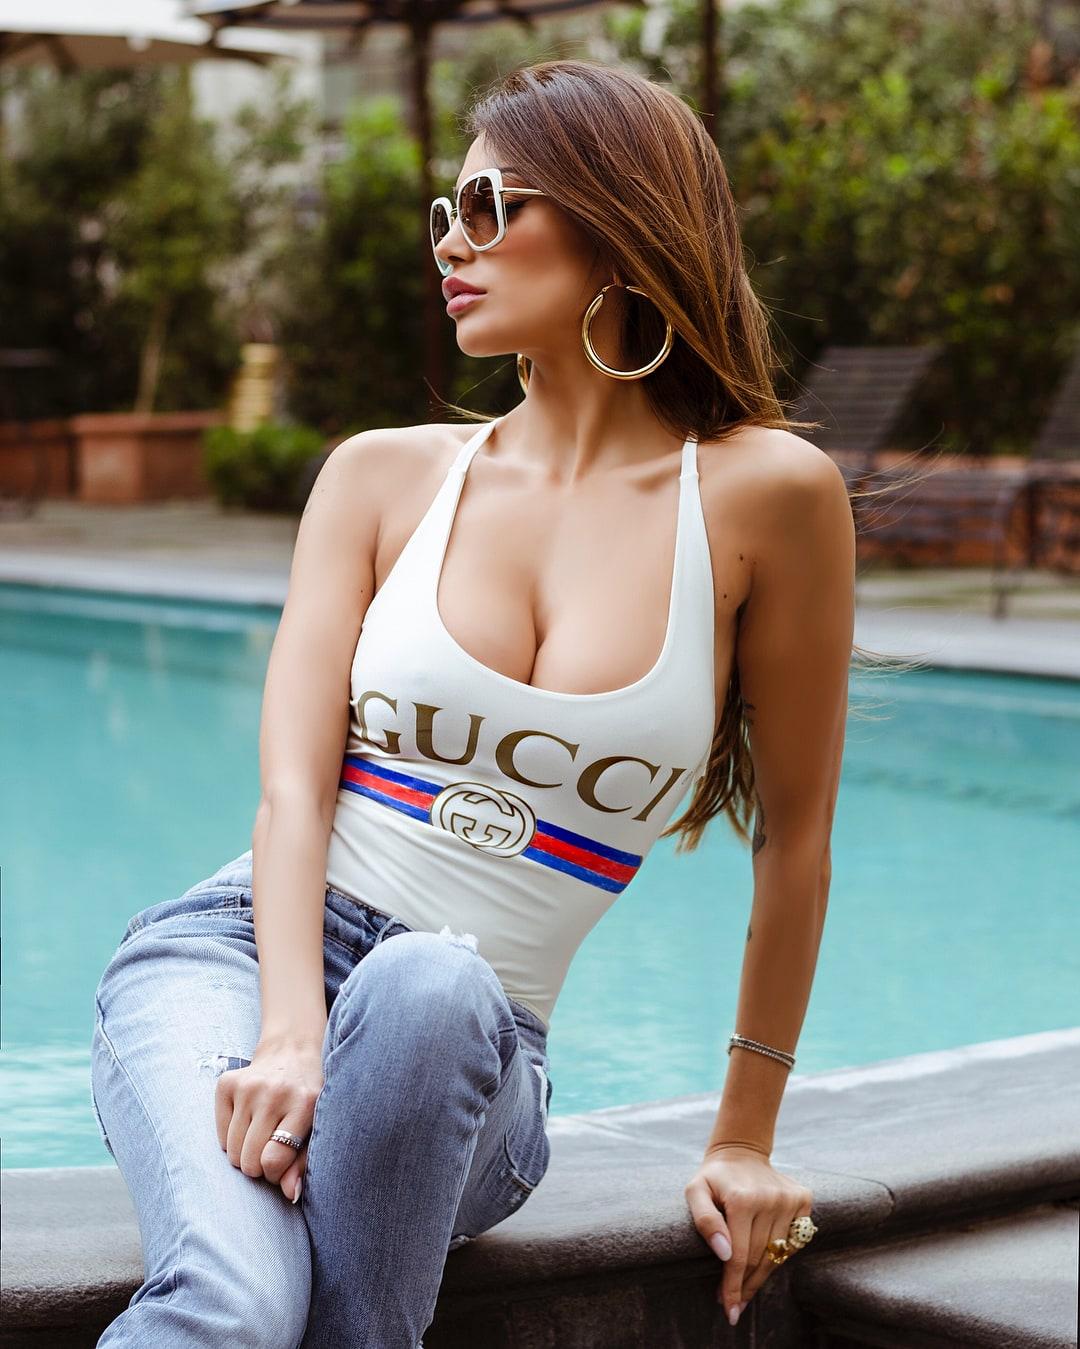 Cleavage Cristina Buccino nude photos 2019